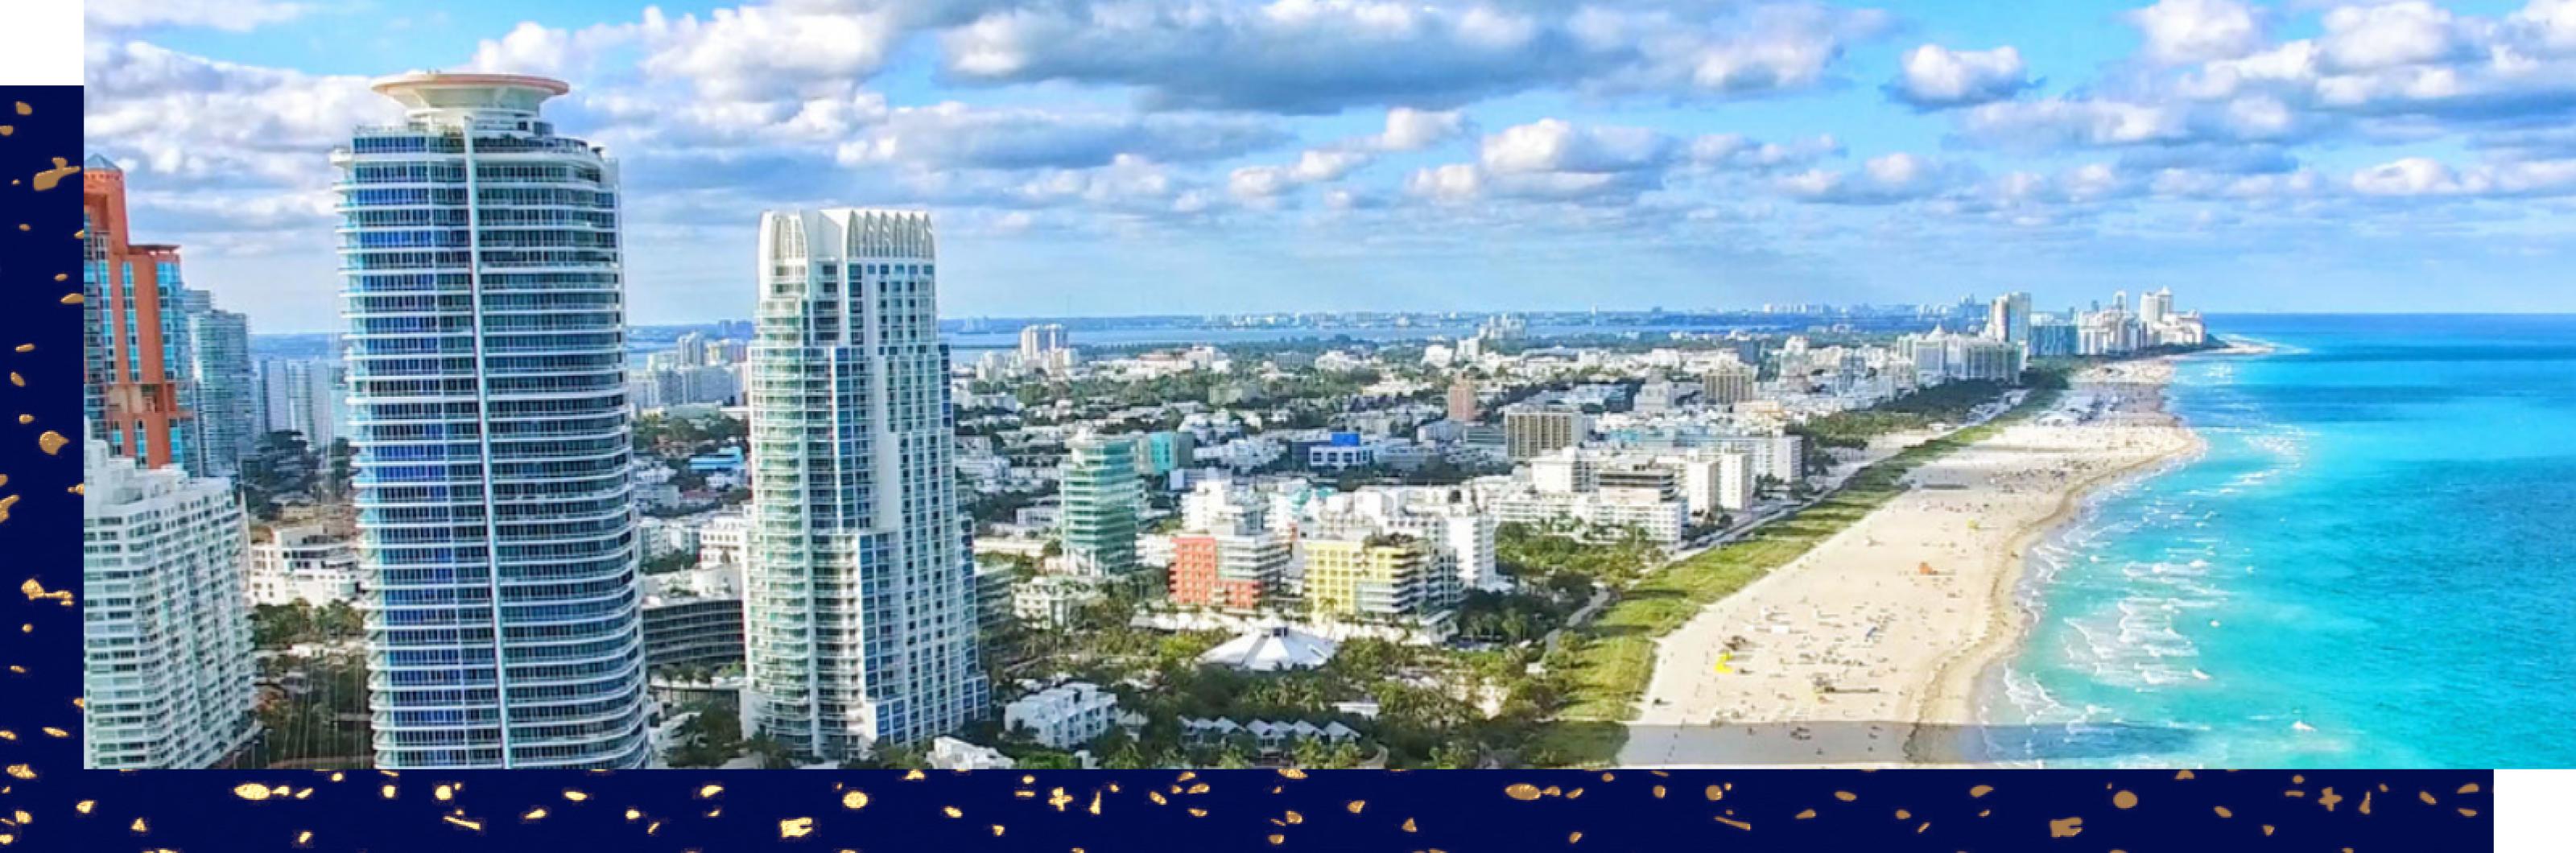 Portfolio Night: Miami